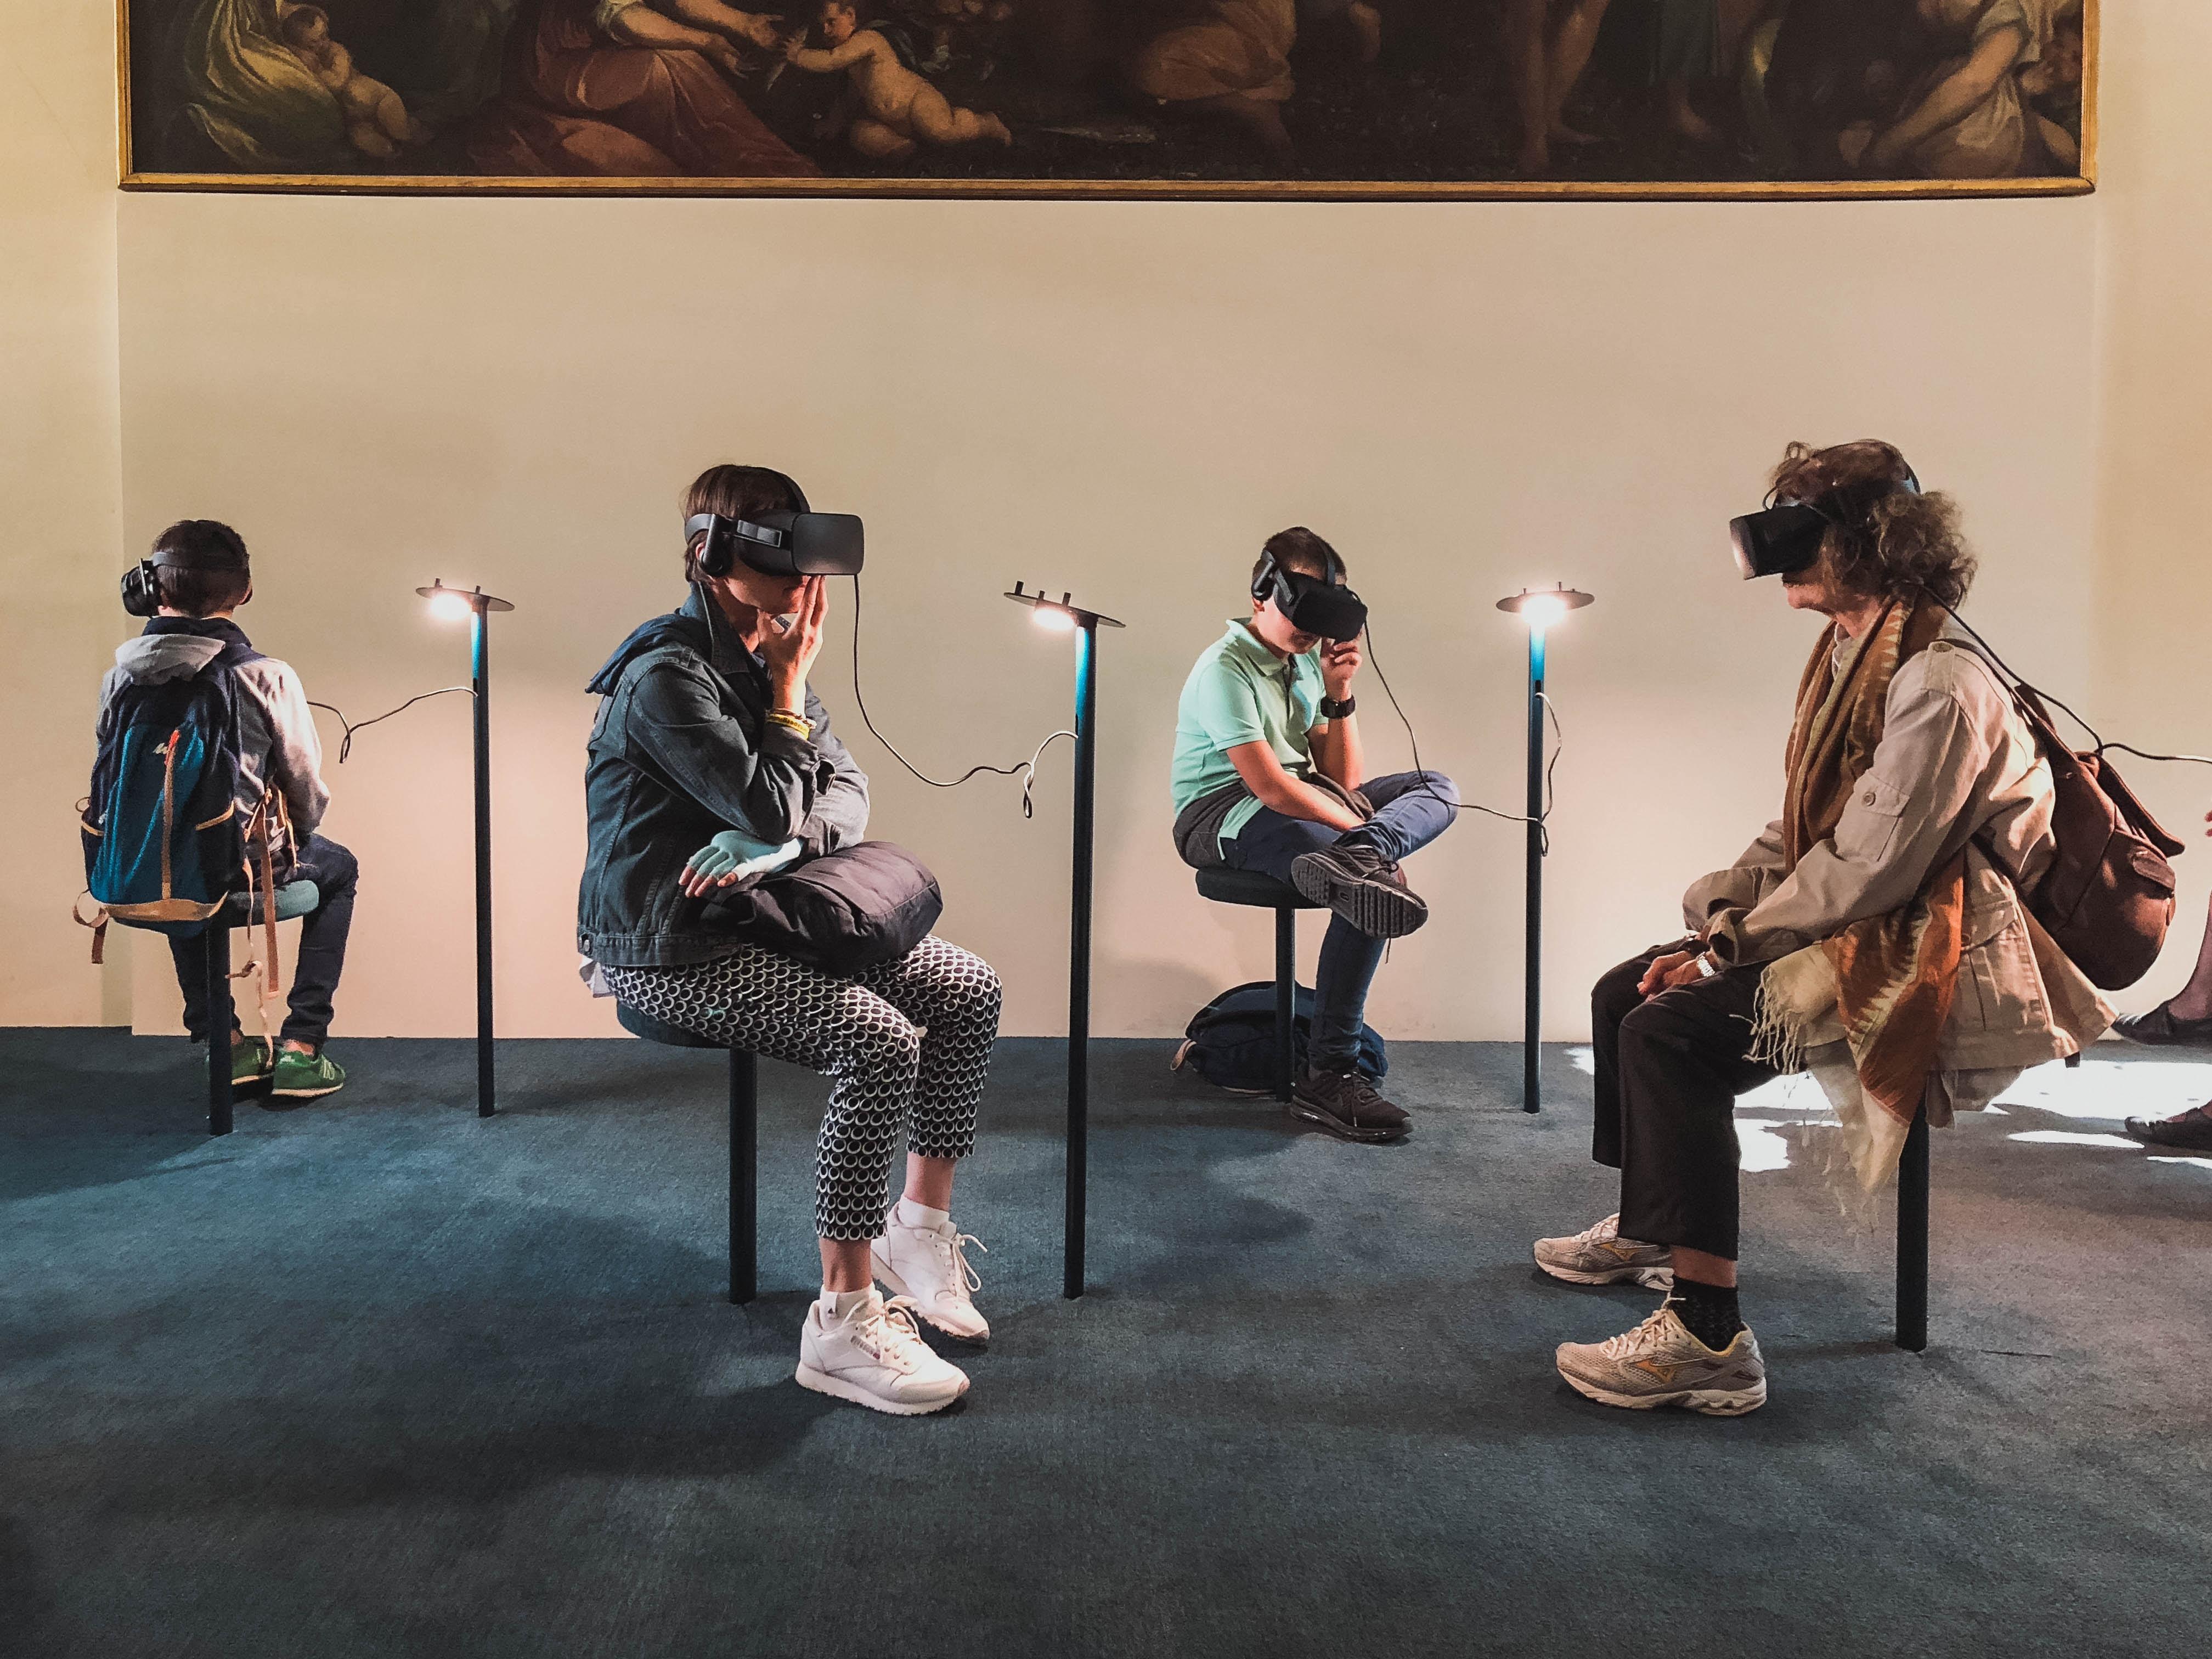 Realidad Virtual Y Entretenimiento 8 | Virtual Reality And Entertainment 8